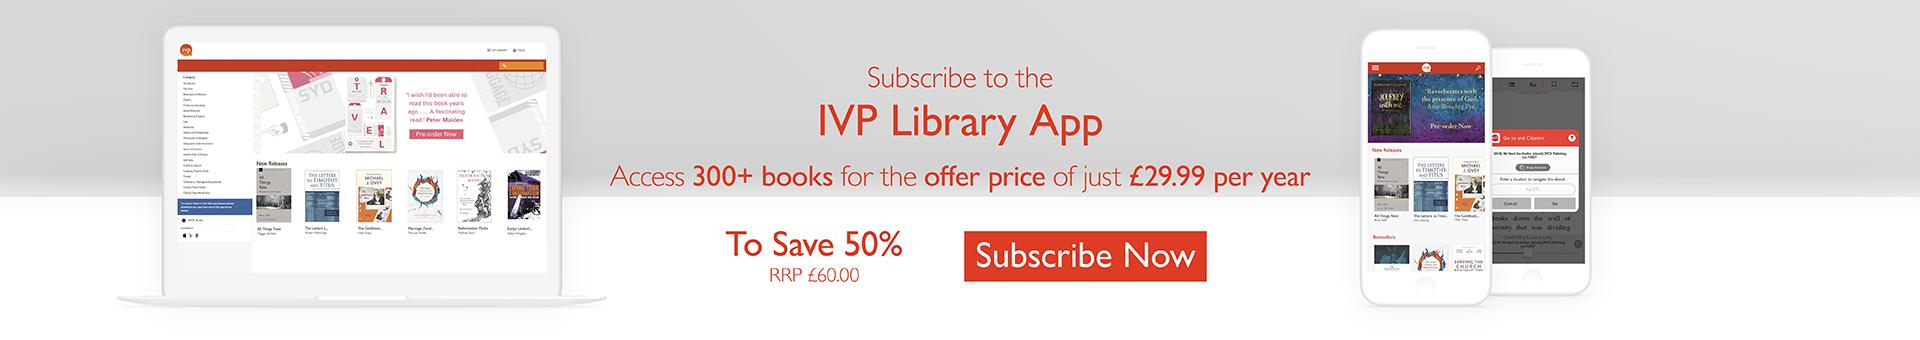 IVP Library App